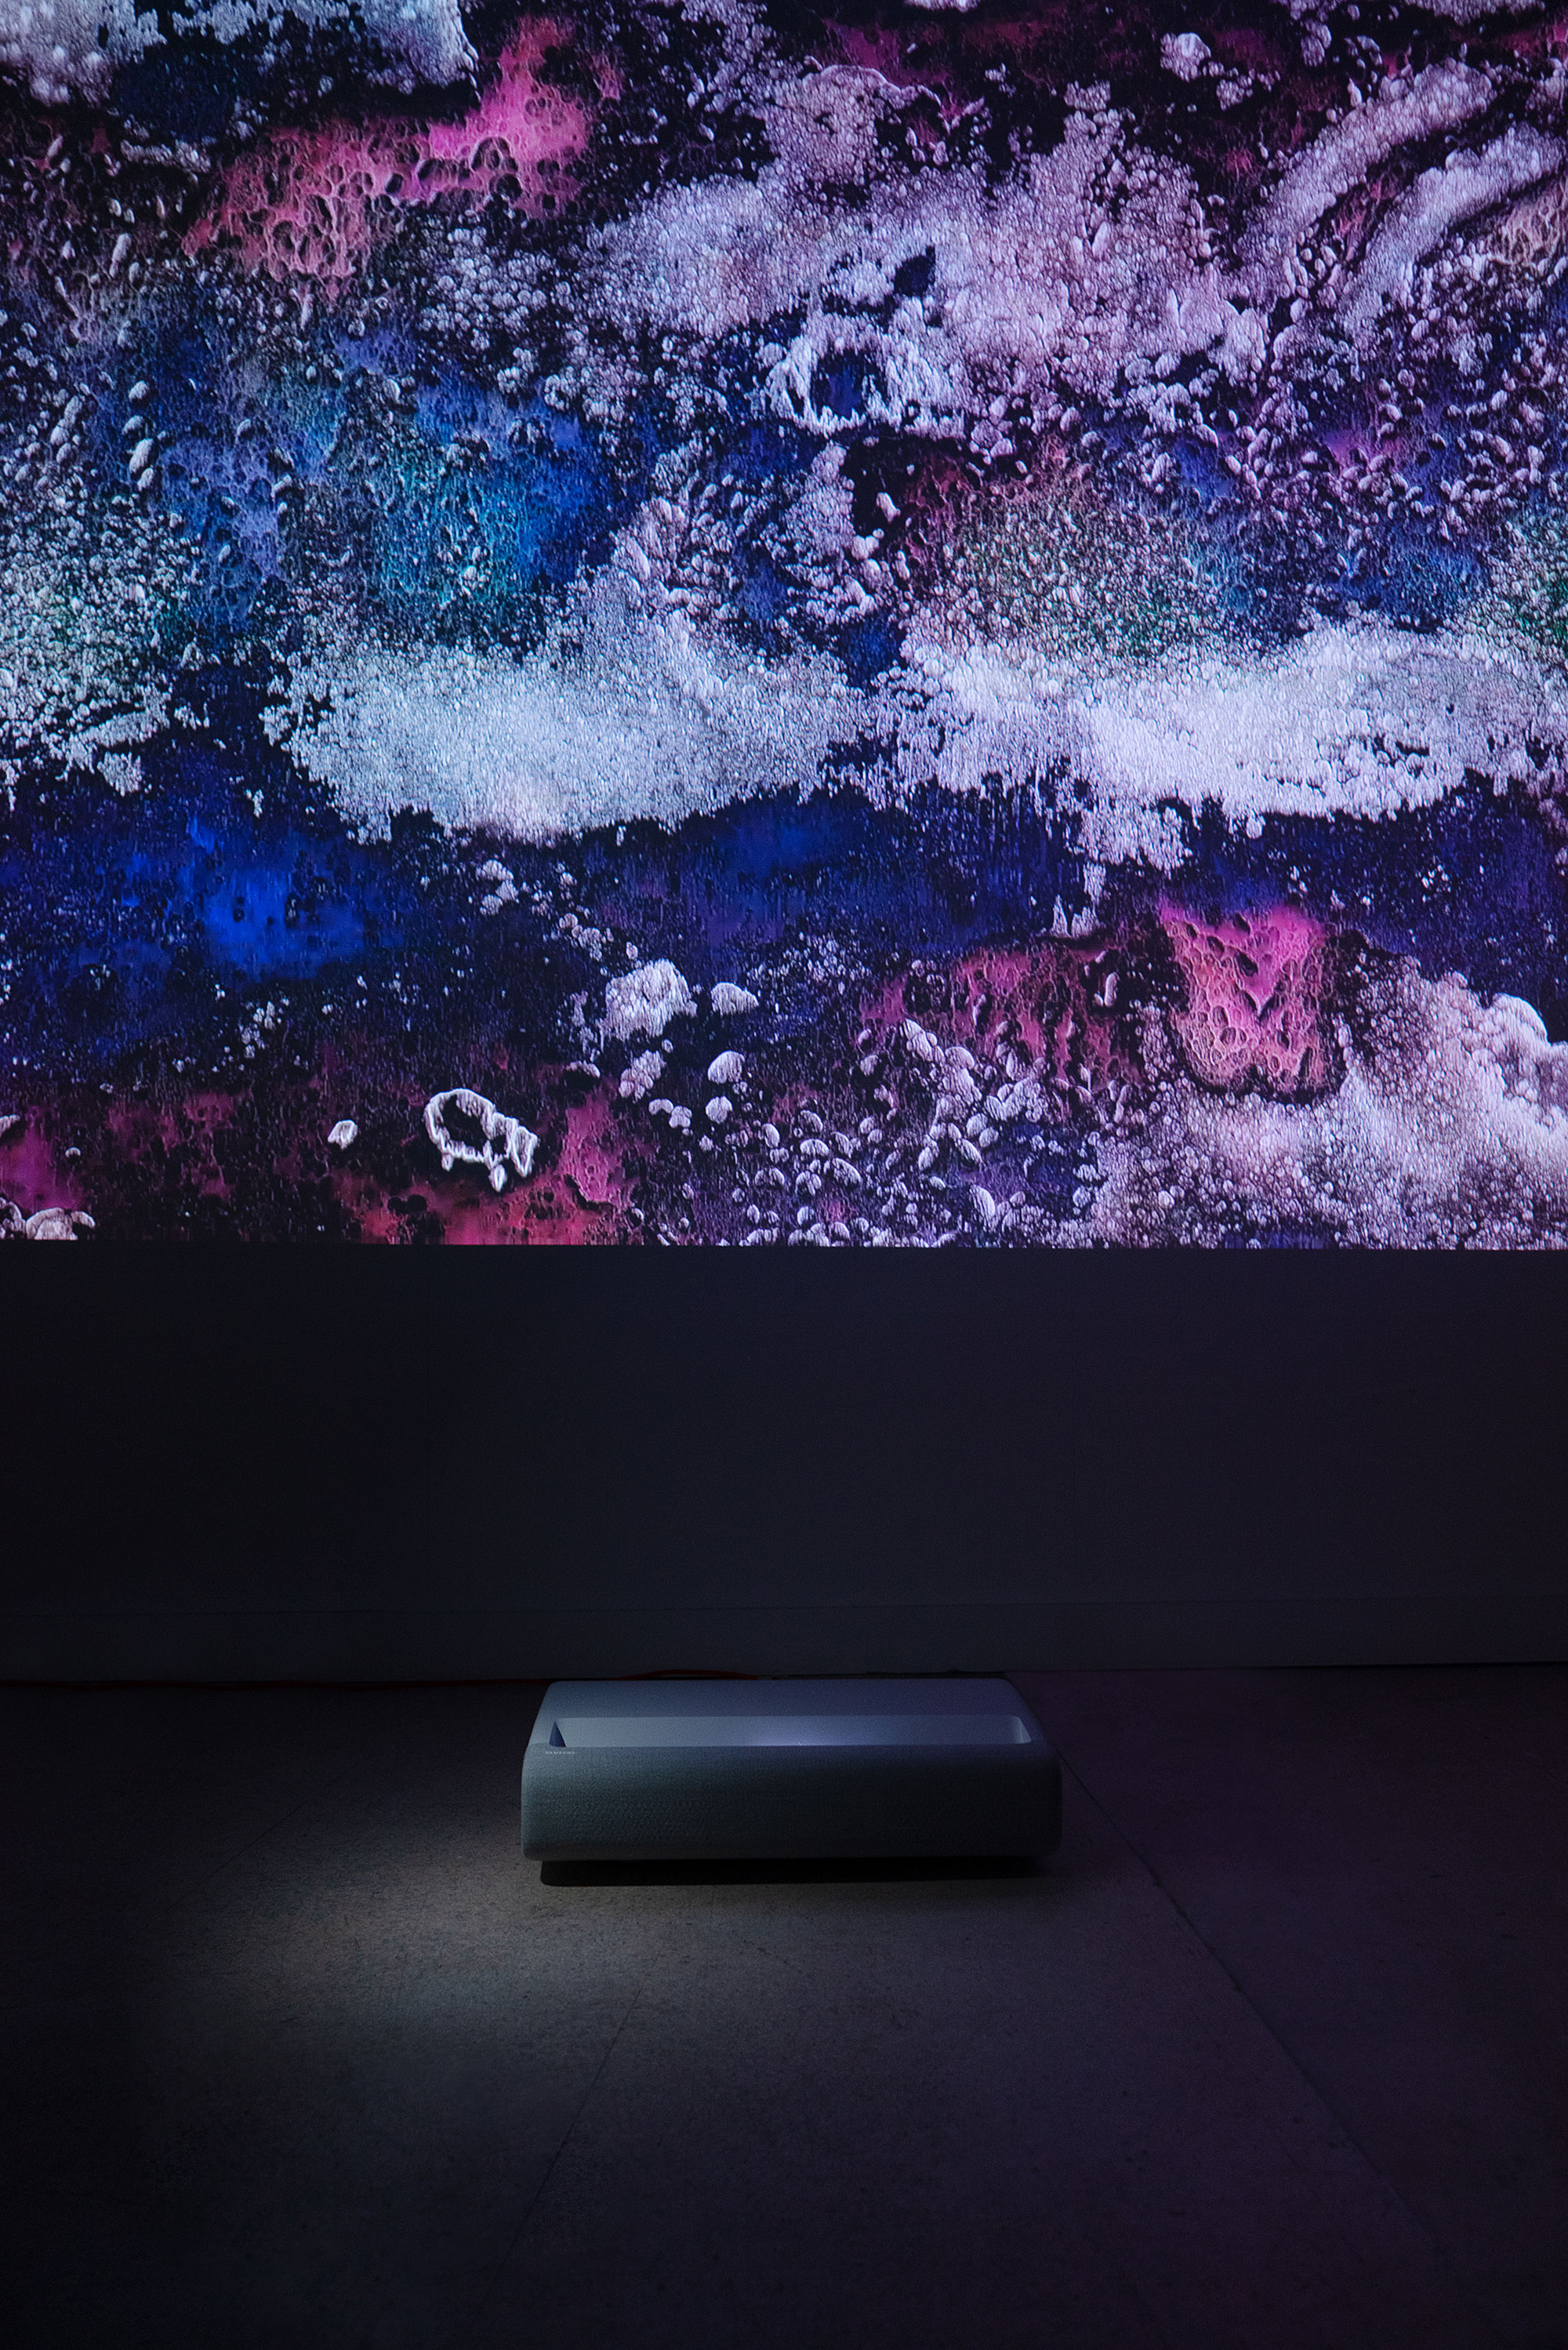 Инсталляция Samsung намеждународной ярмарке Cosmosсow